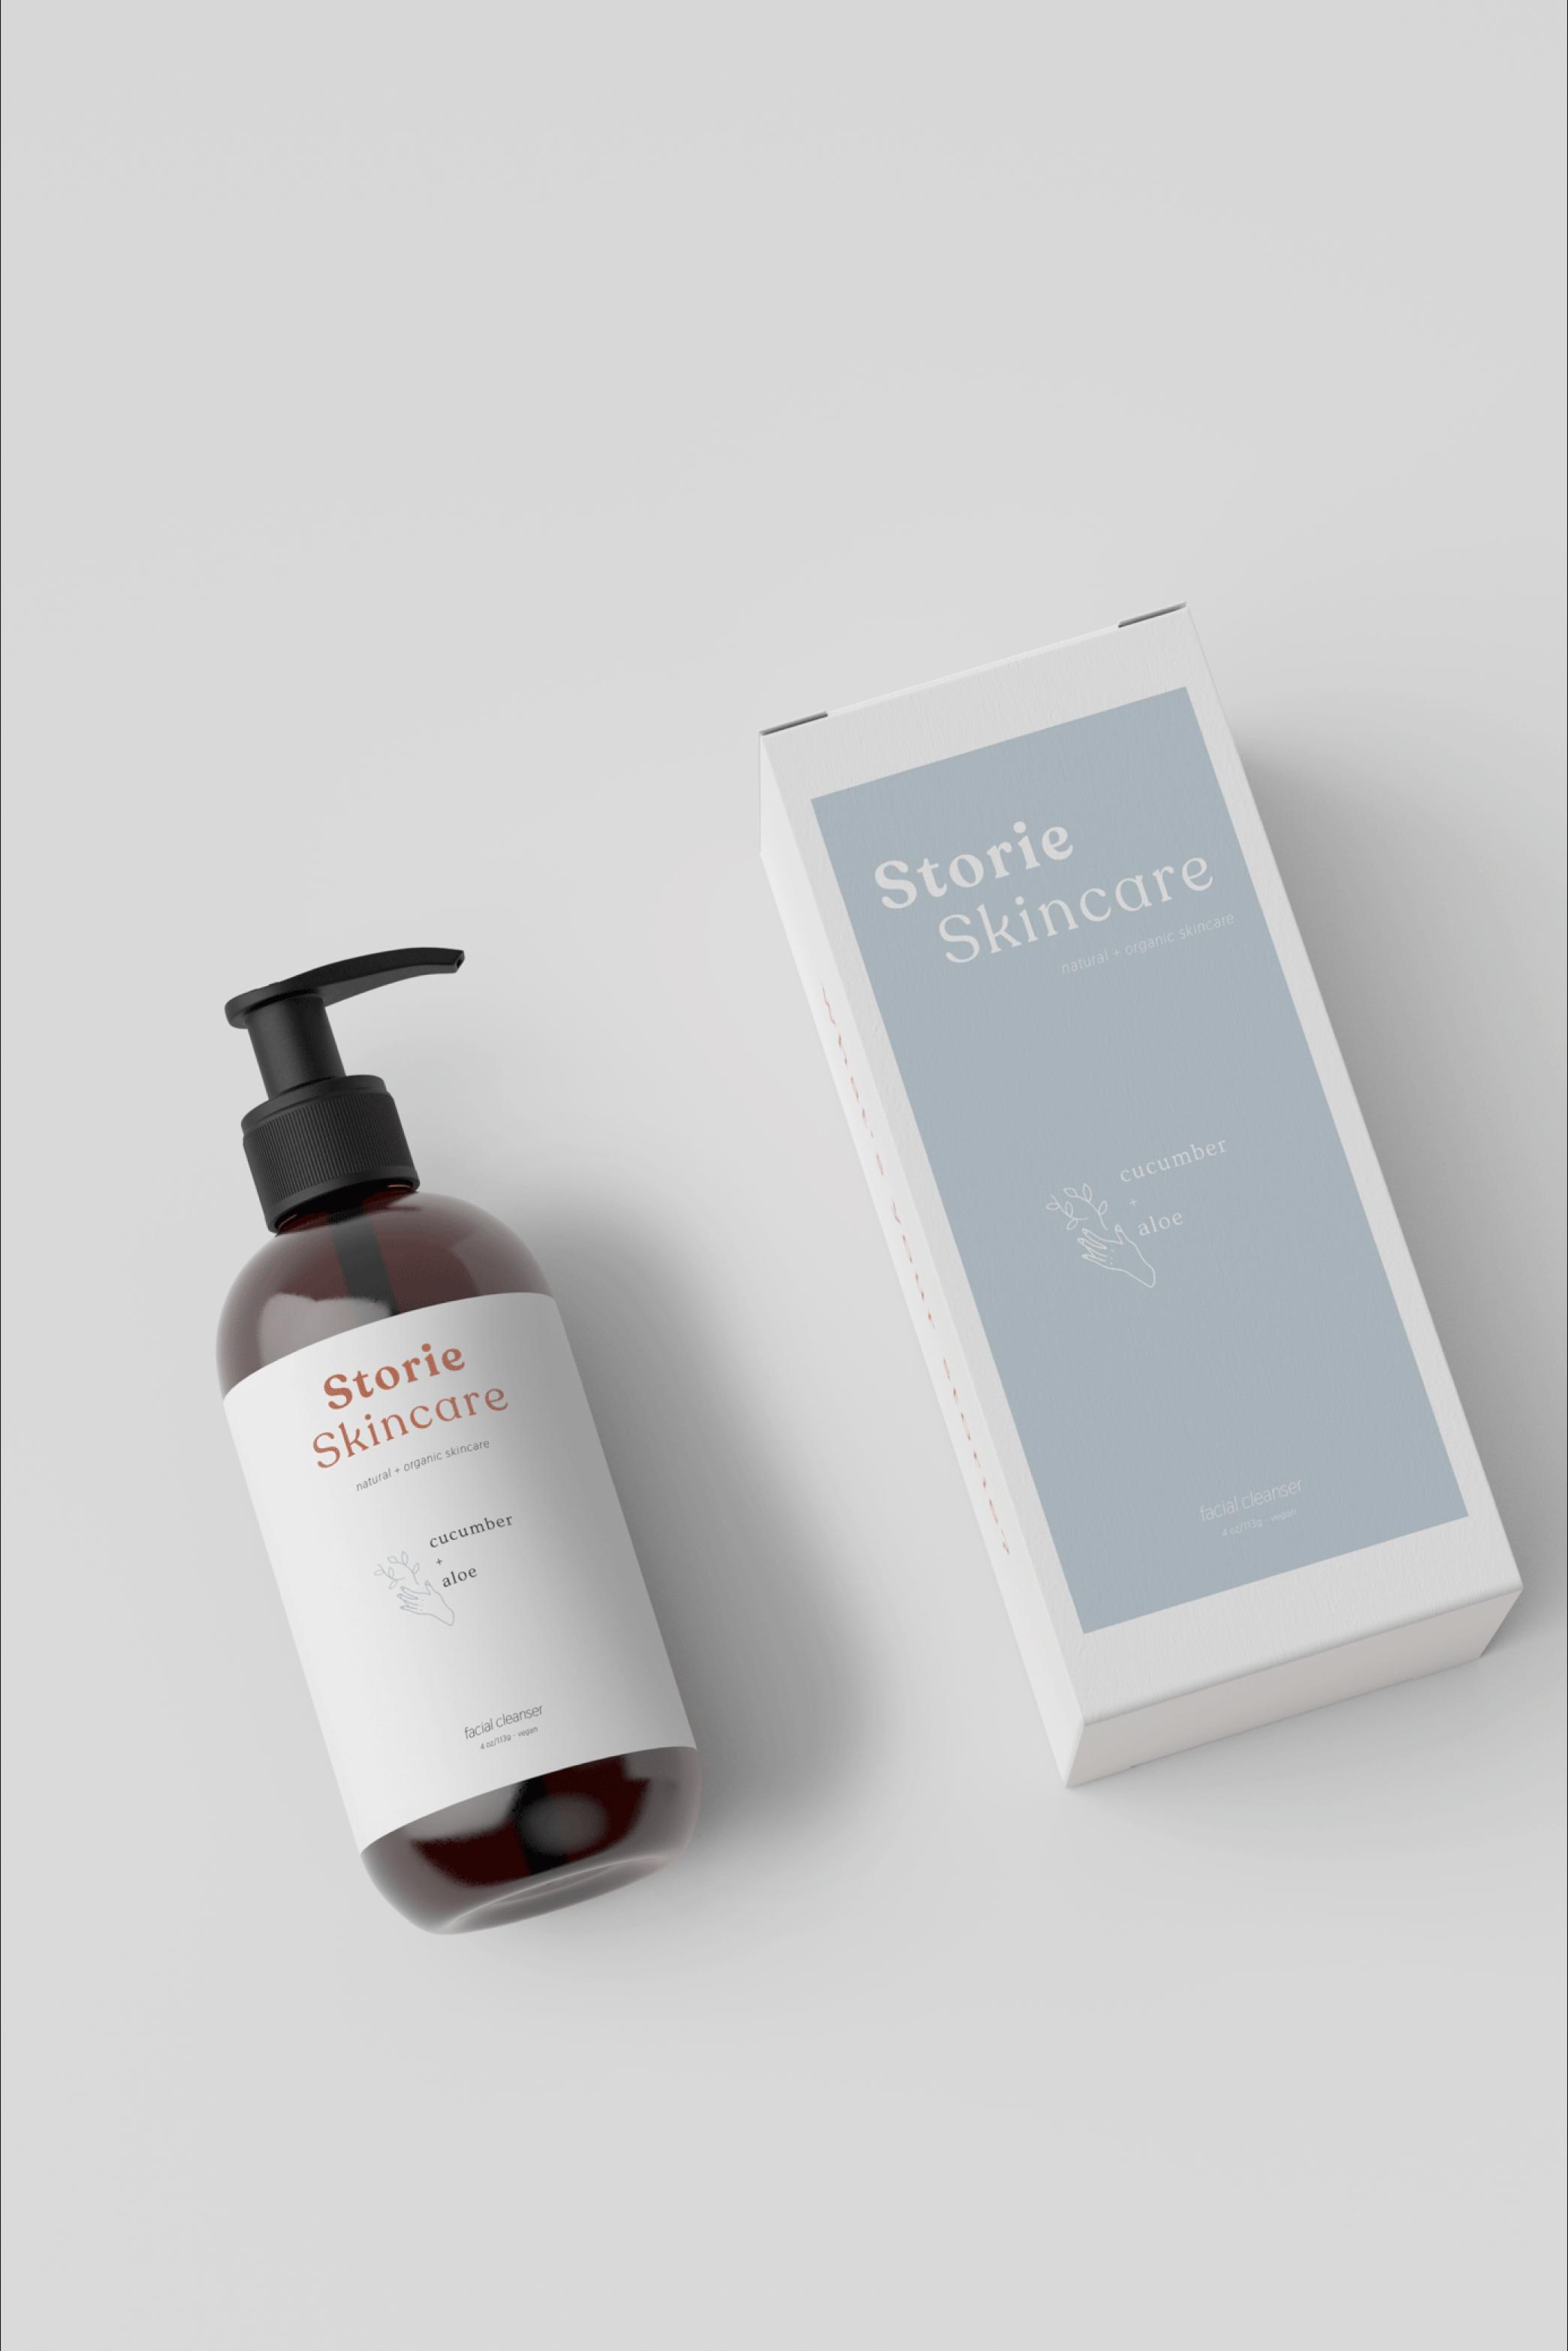 Crisp, fresh and purposeful packaging design for organic